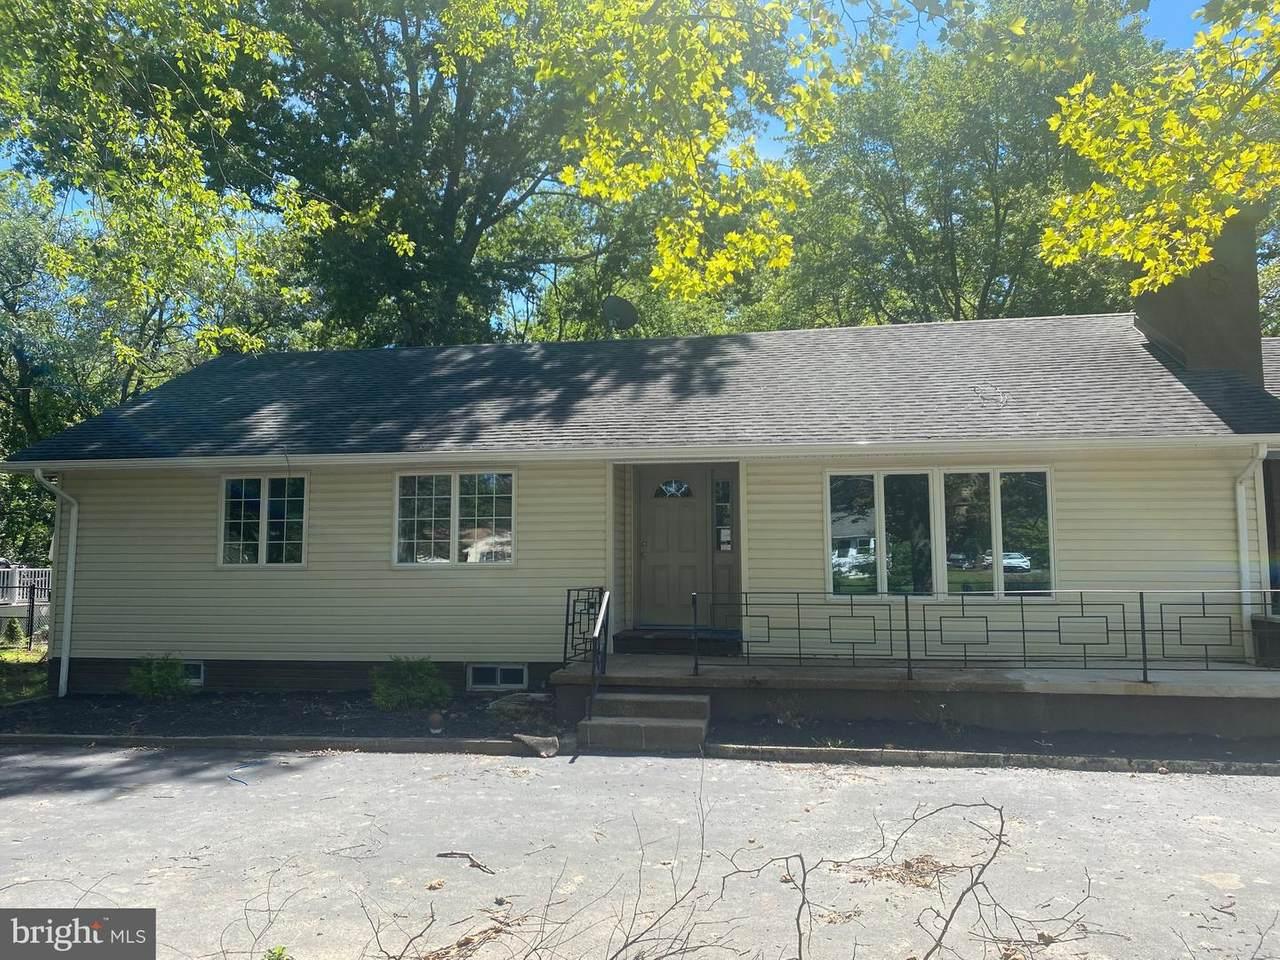 291 Pennington Lawrenceville Road - Photo 1